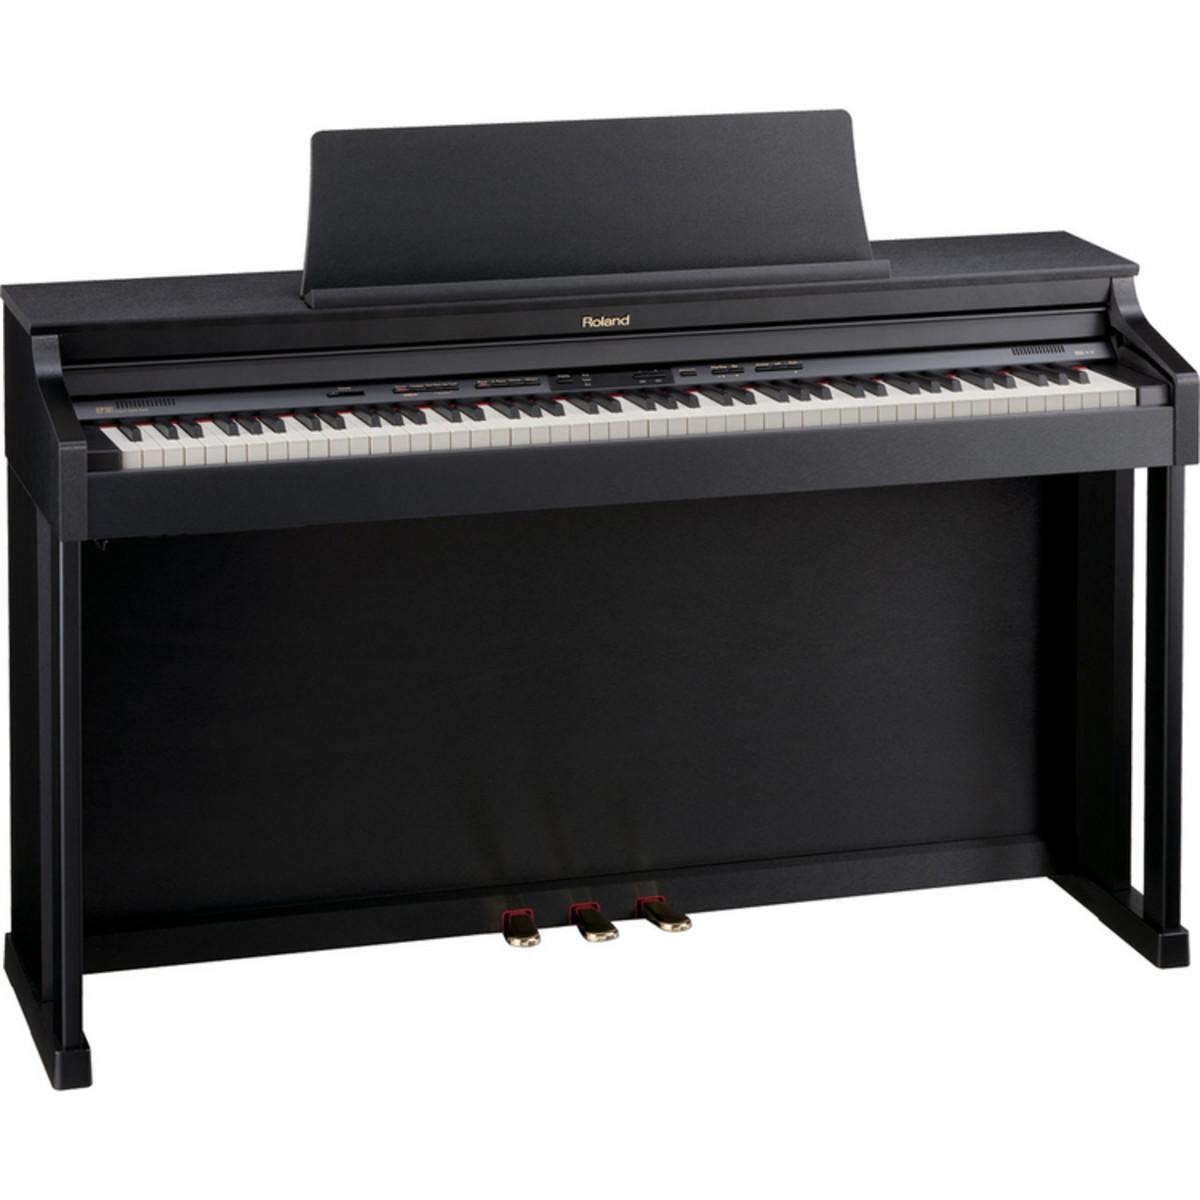 Roland Digital Piano Model Hp 5700 : disc roland hp 305 digital piano satin black at gear4music ~ Vivirlamusica.com Haus und Dekorationen